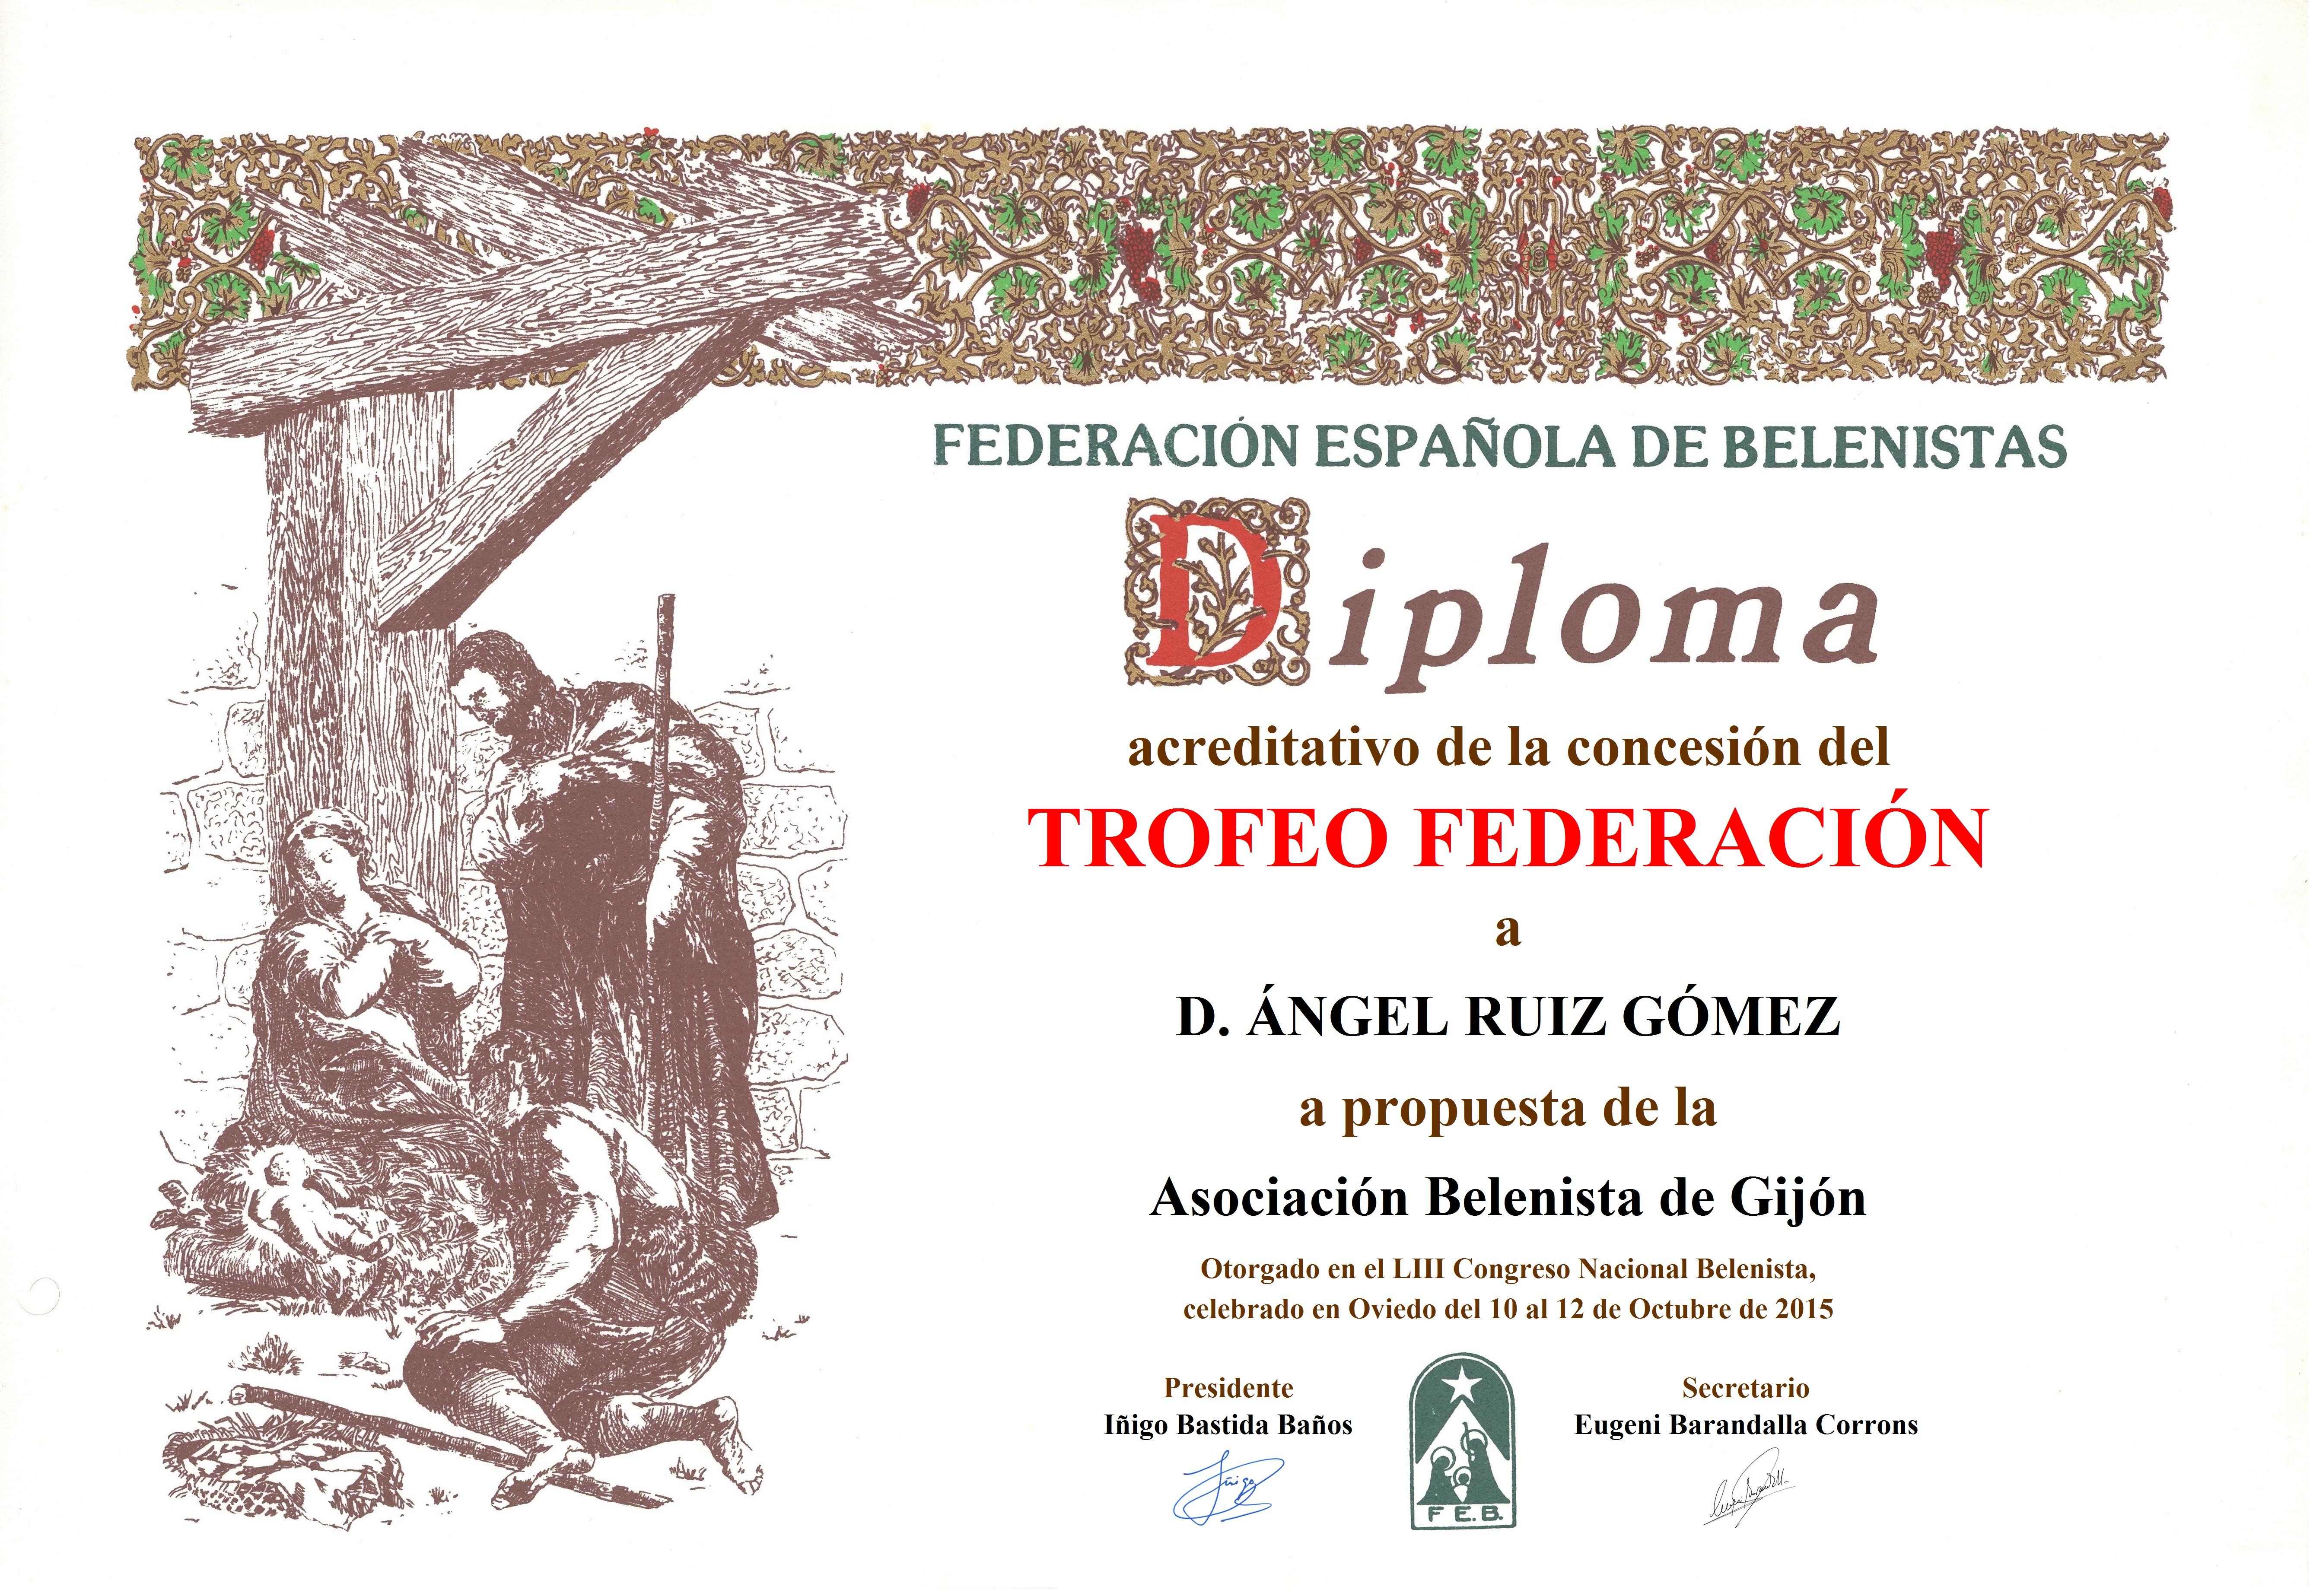 Diploma Trofeo FEB 2015 Ángel Ruiz Gómez